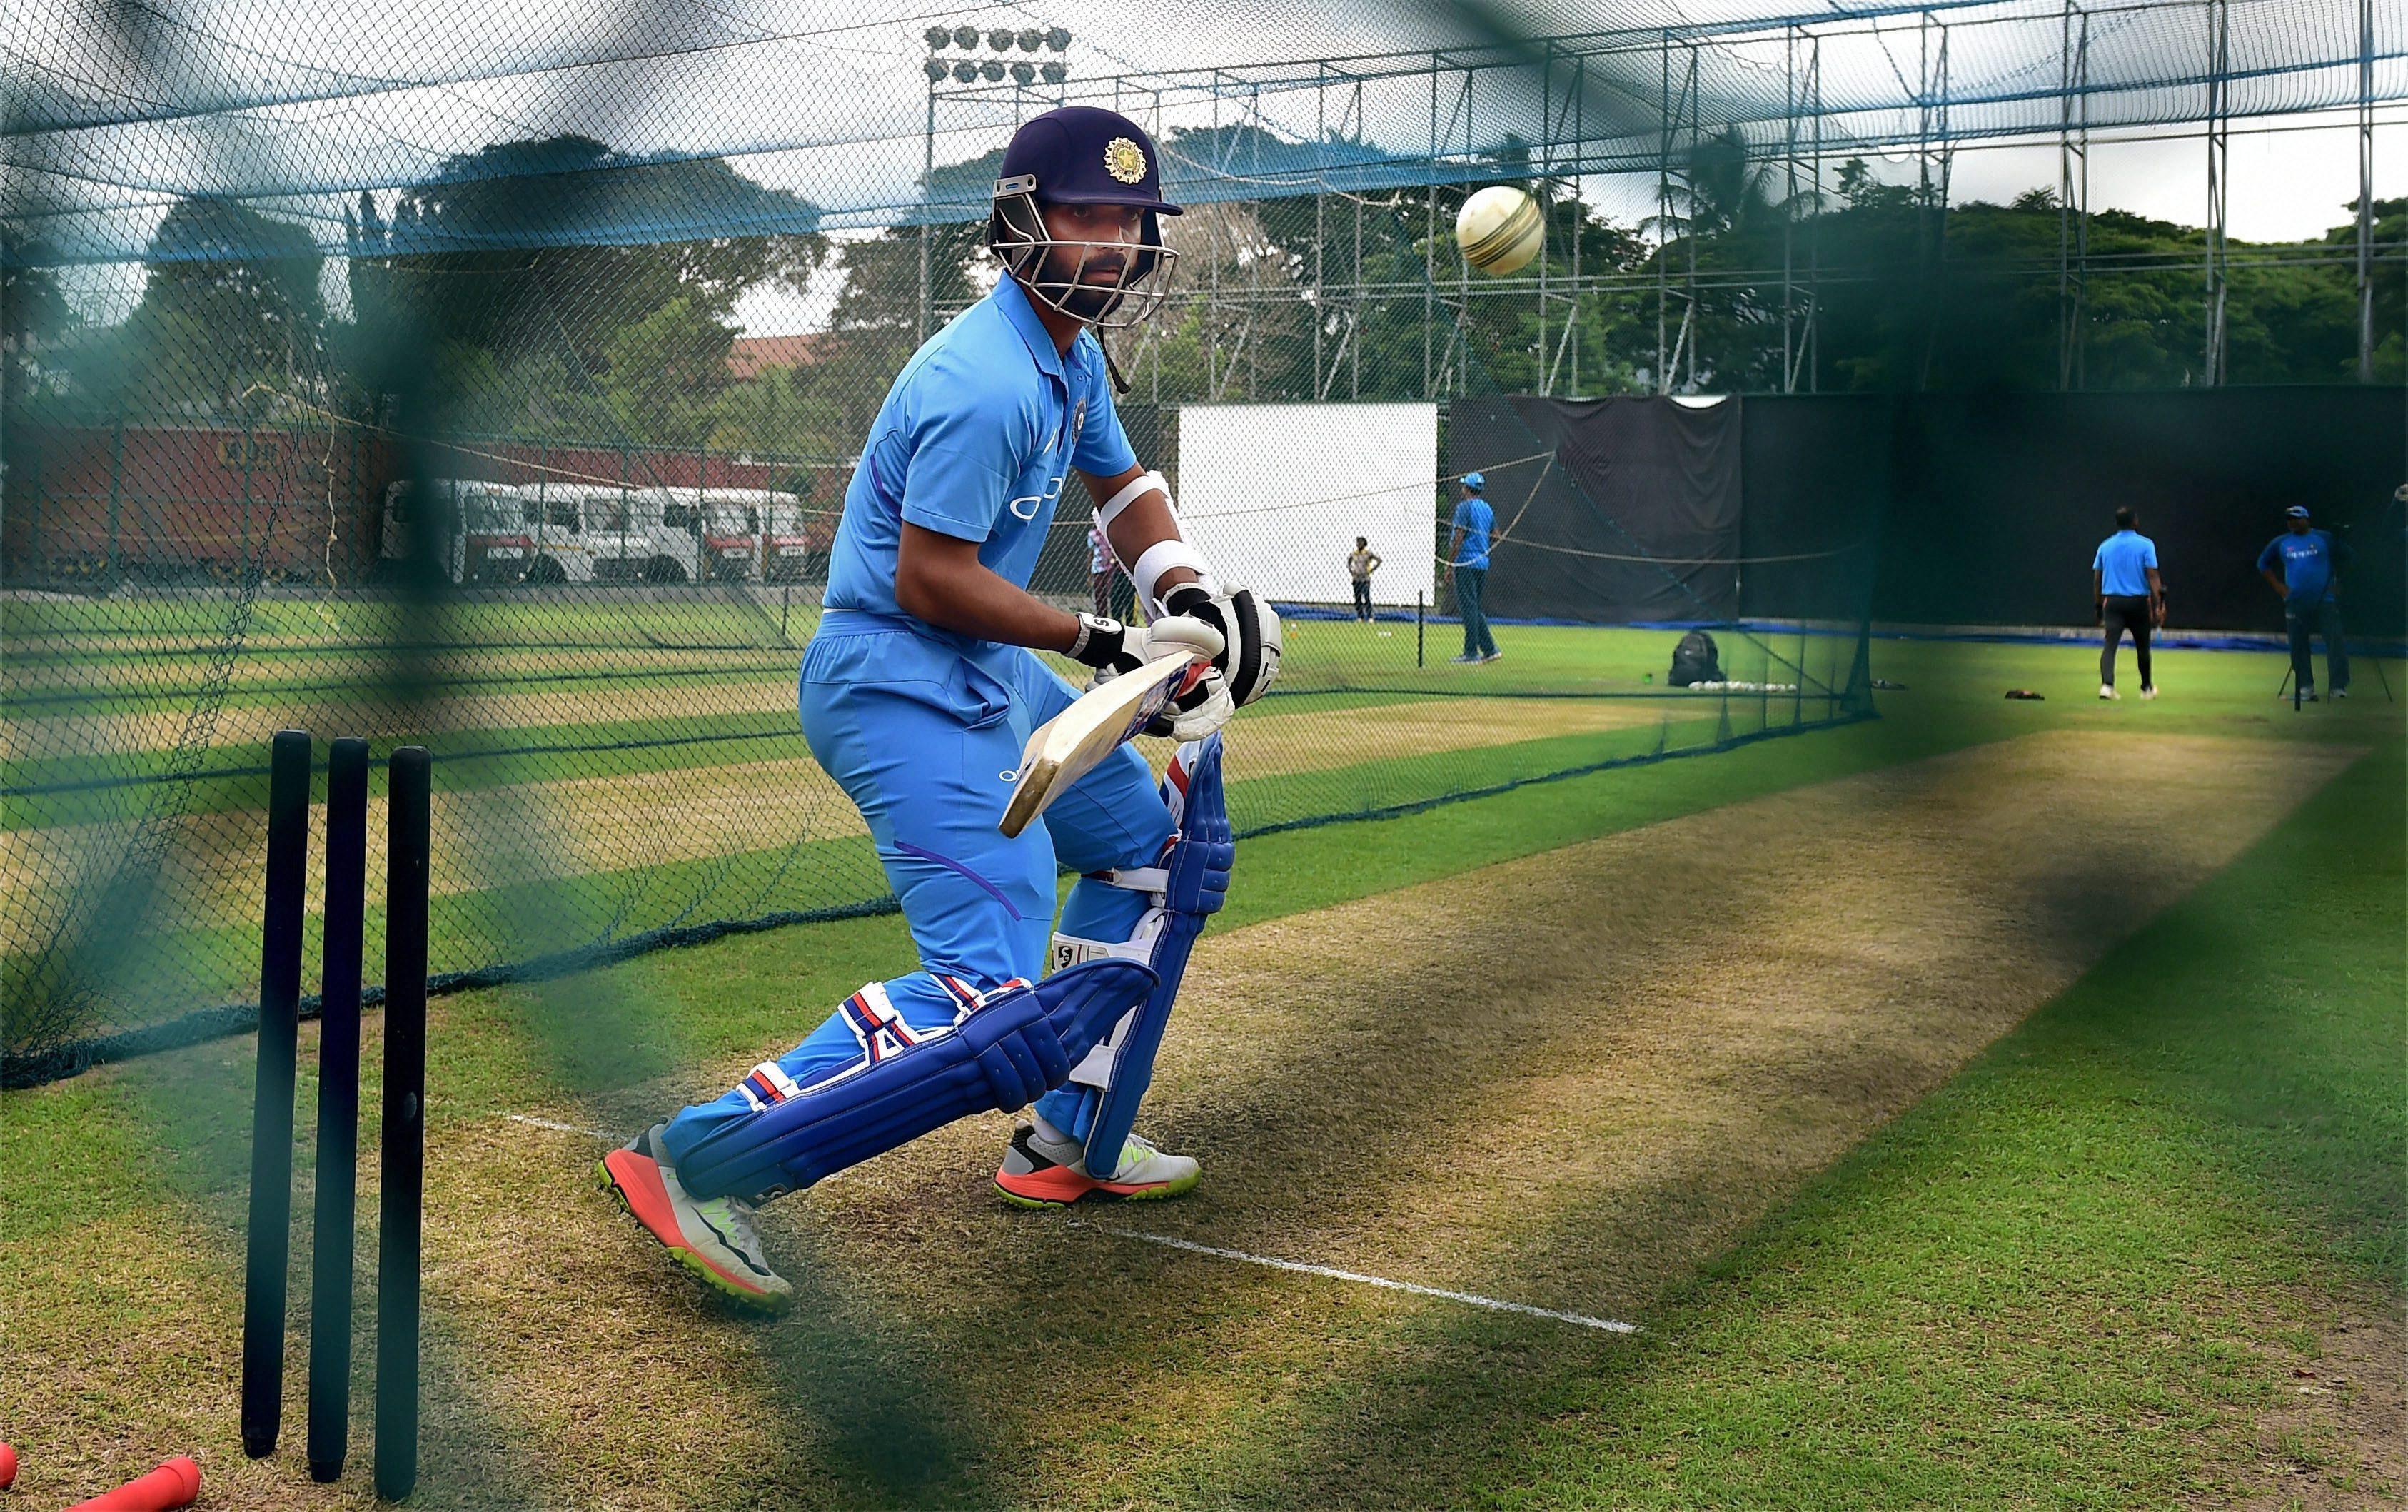 Ajinkya Rahane bats during a practice session in Kandy